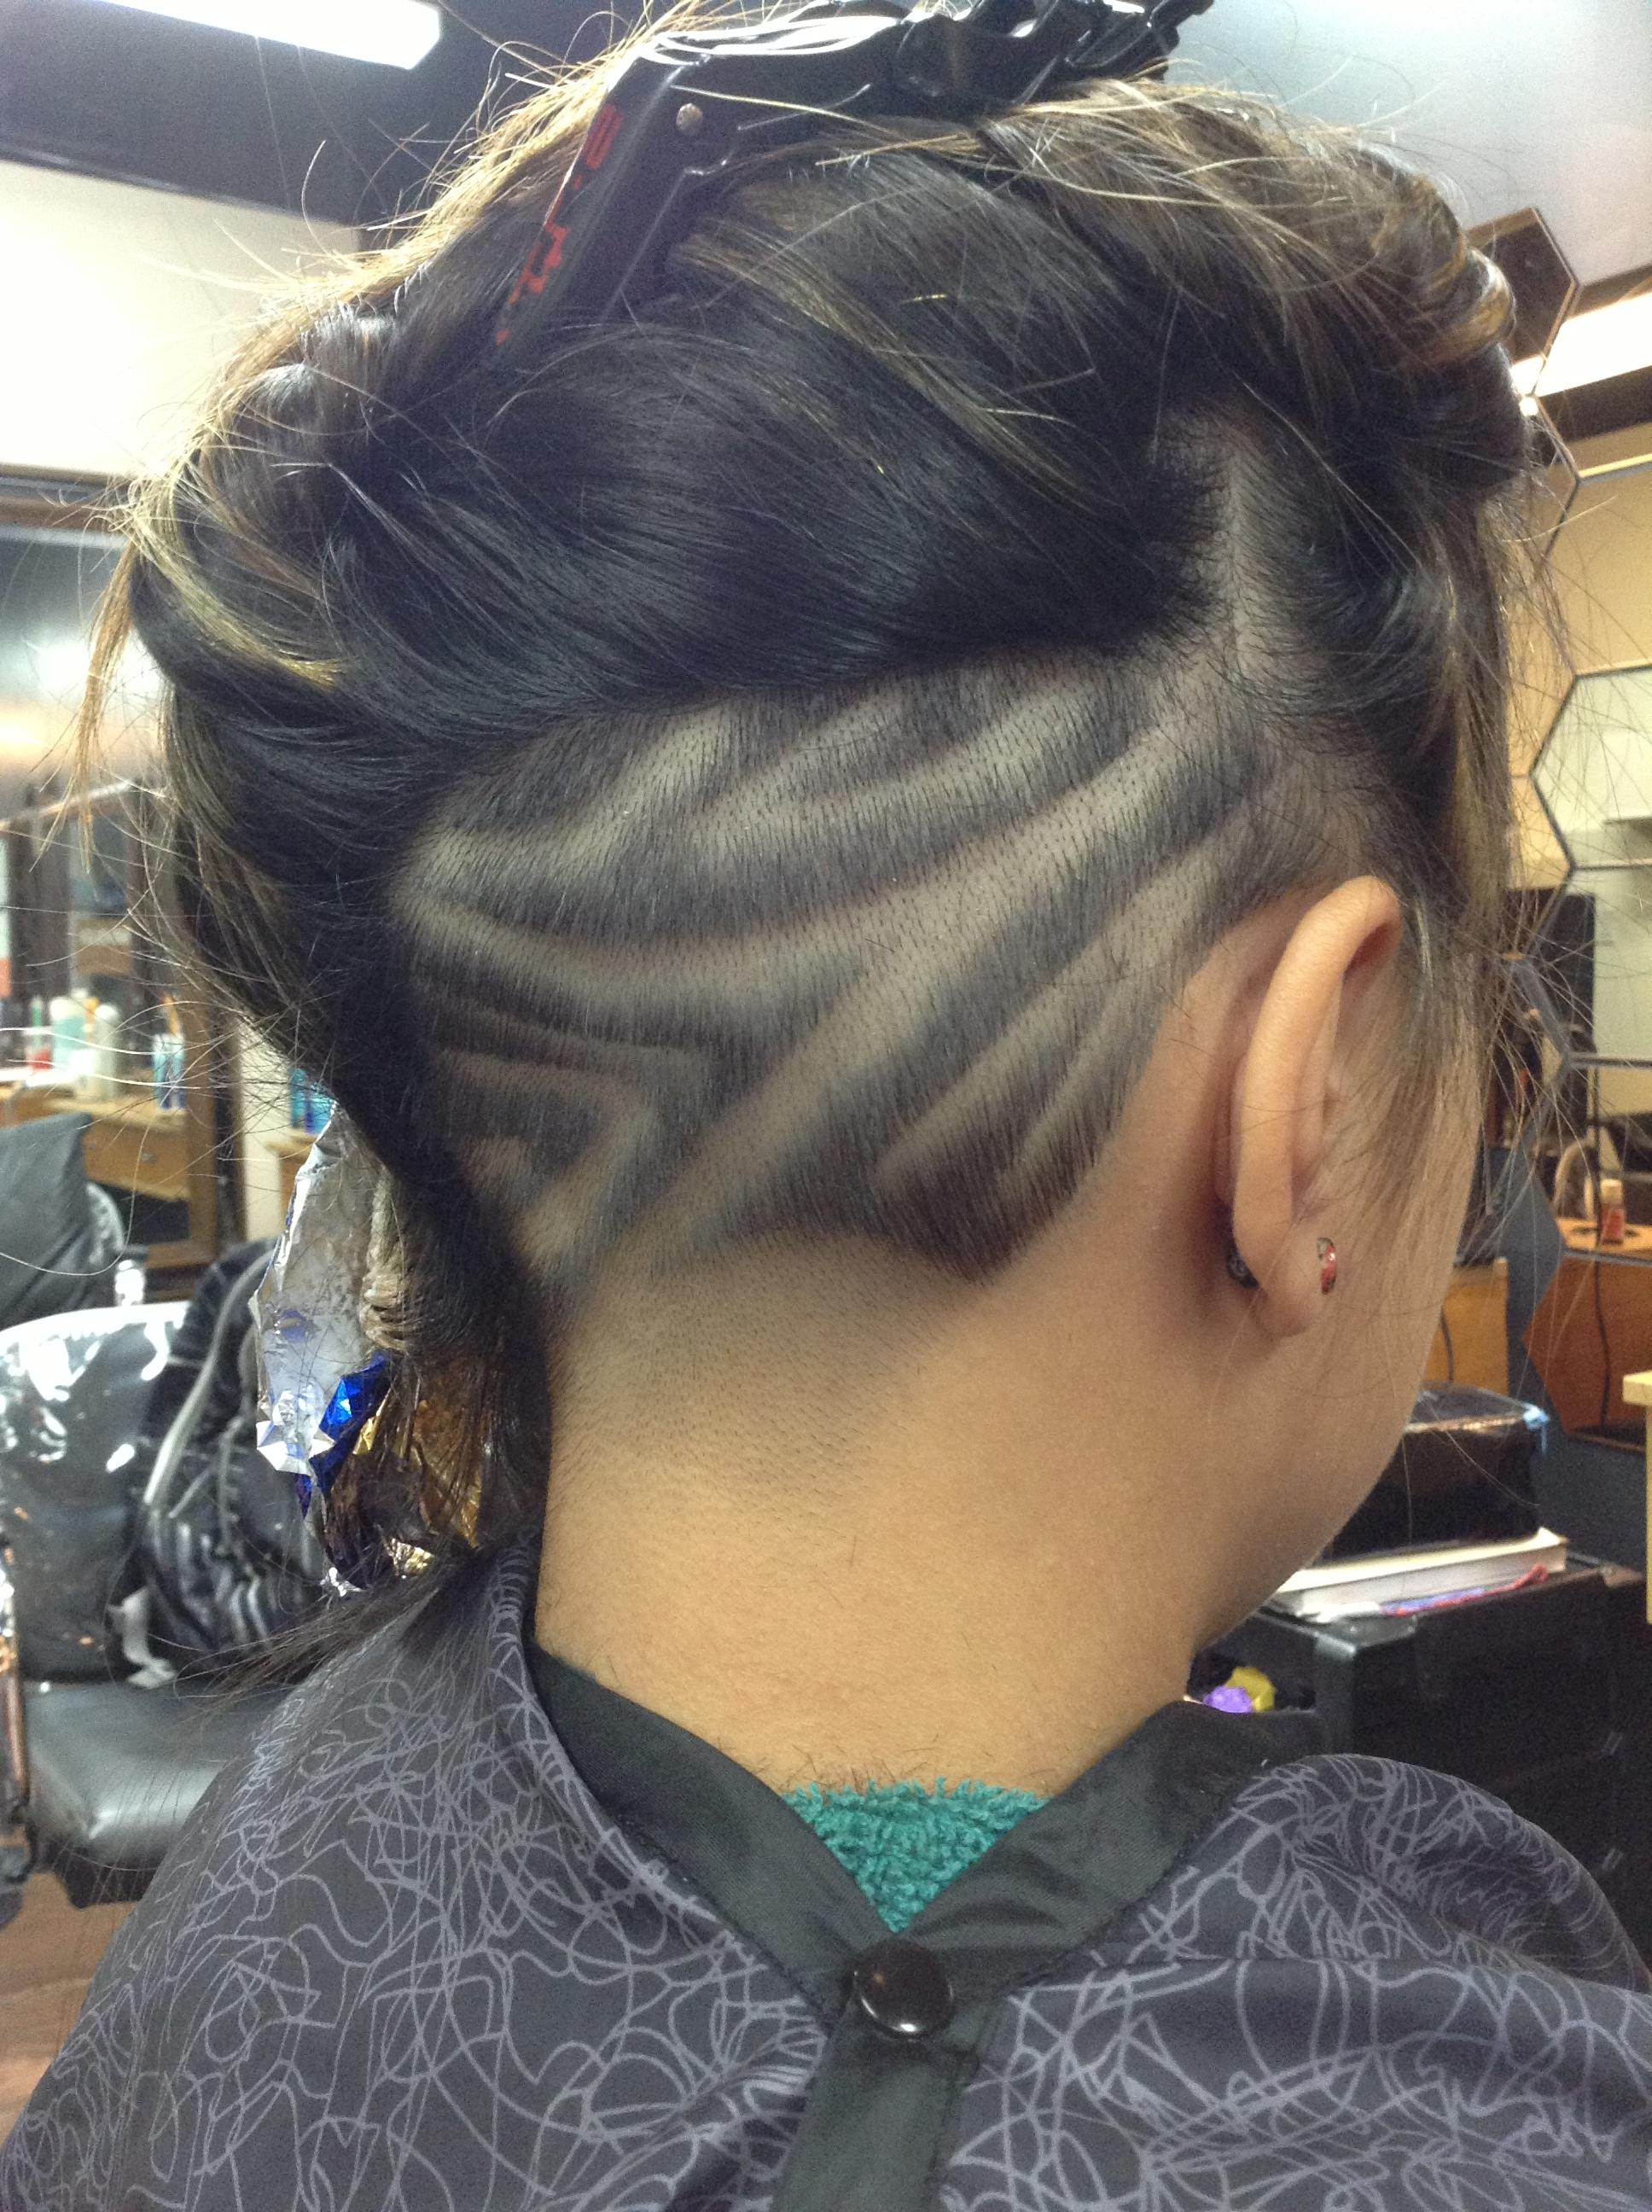 Free Hand Hair Graffiti -